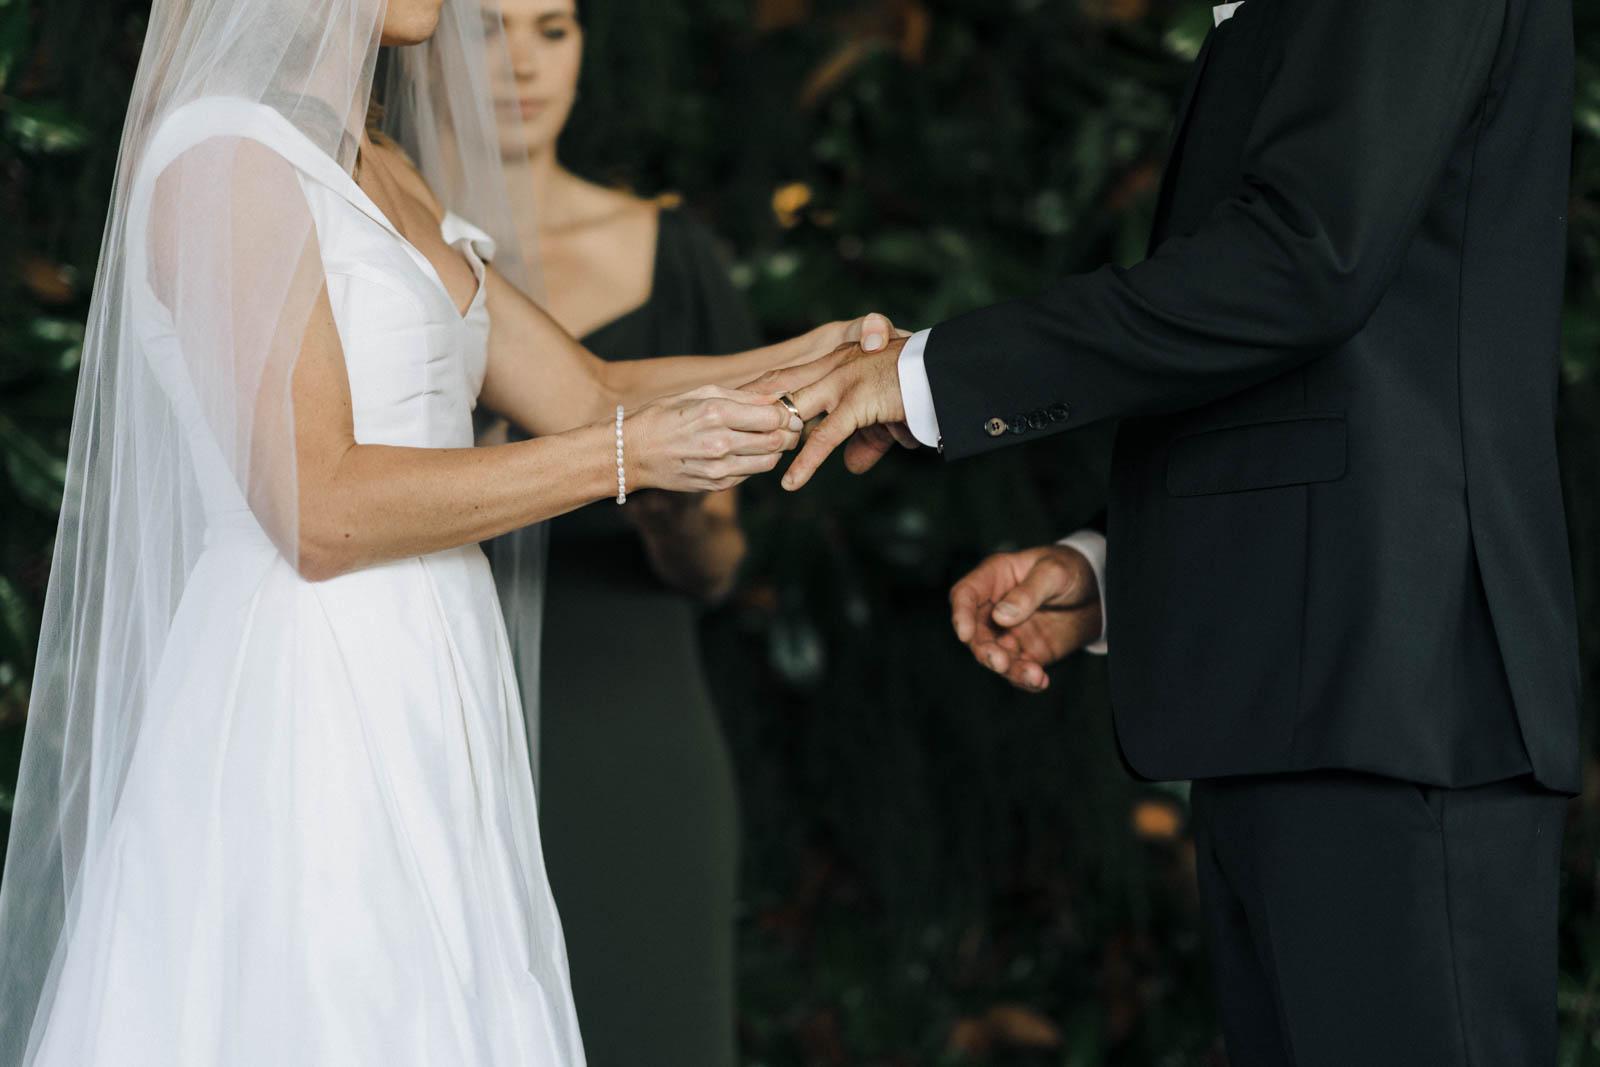 newfound-s-p-mt-maunganui-tauranga-wedding-photographer-1709-A9_06501